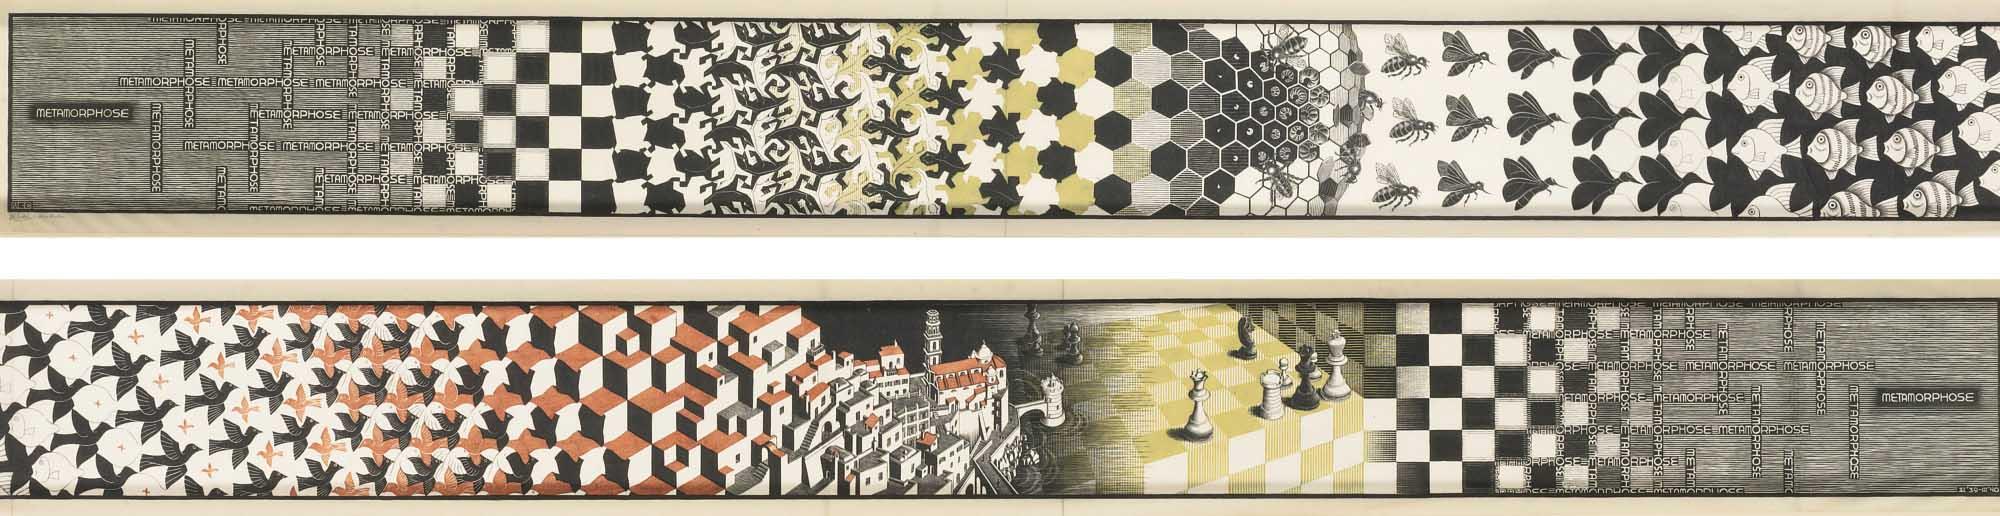 metamorfosi Escher_Tulipando